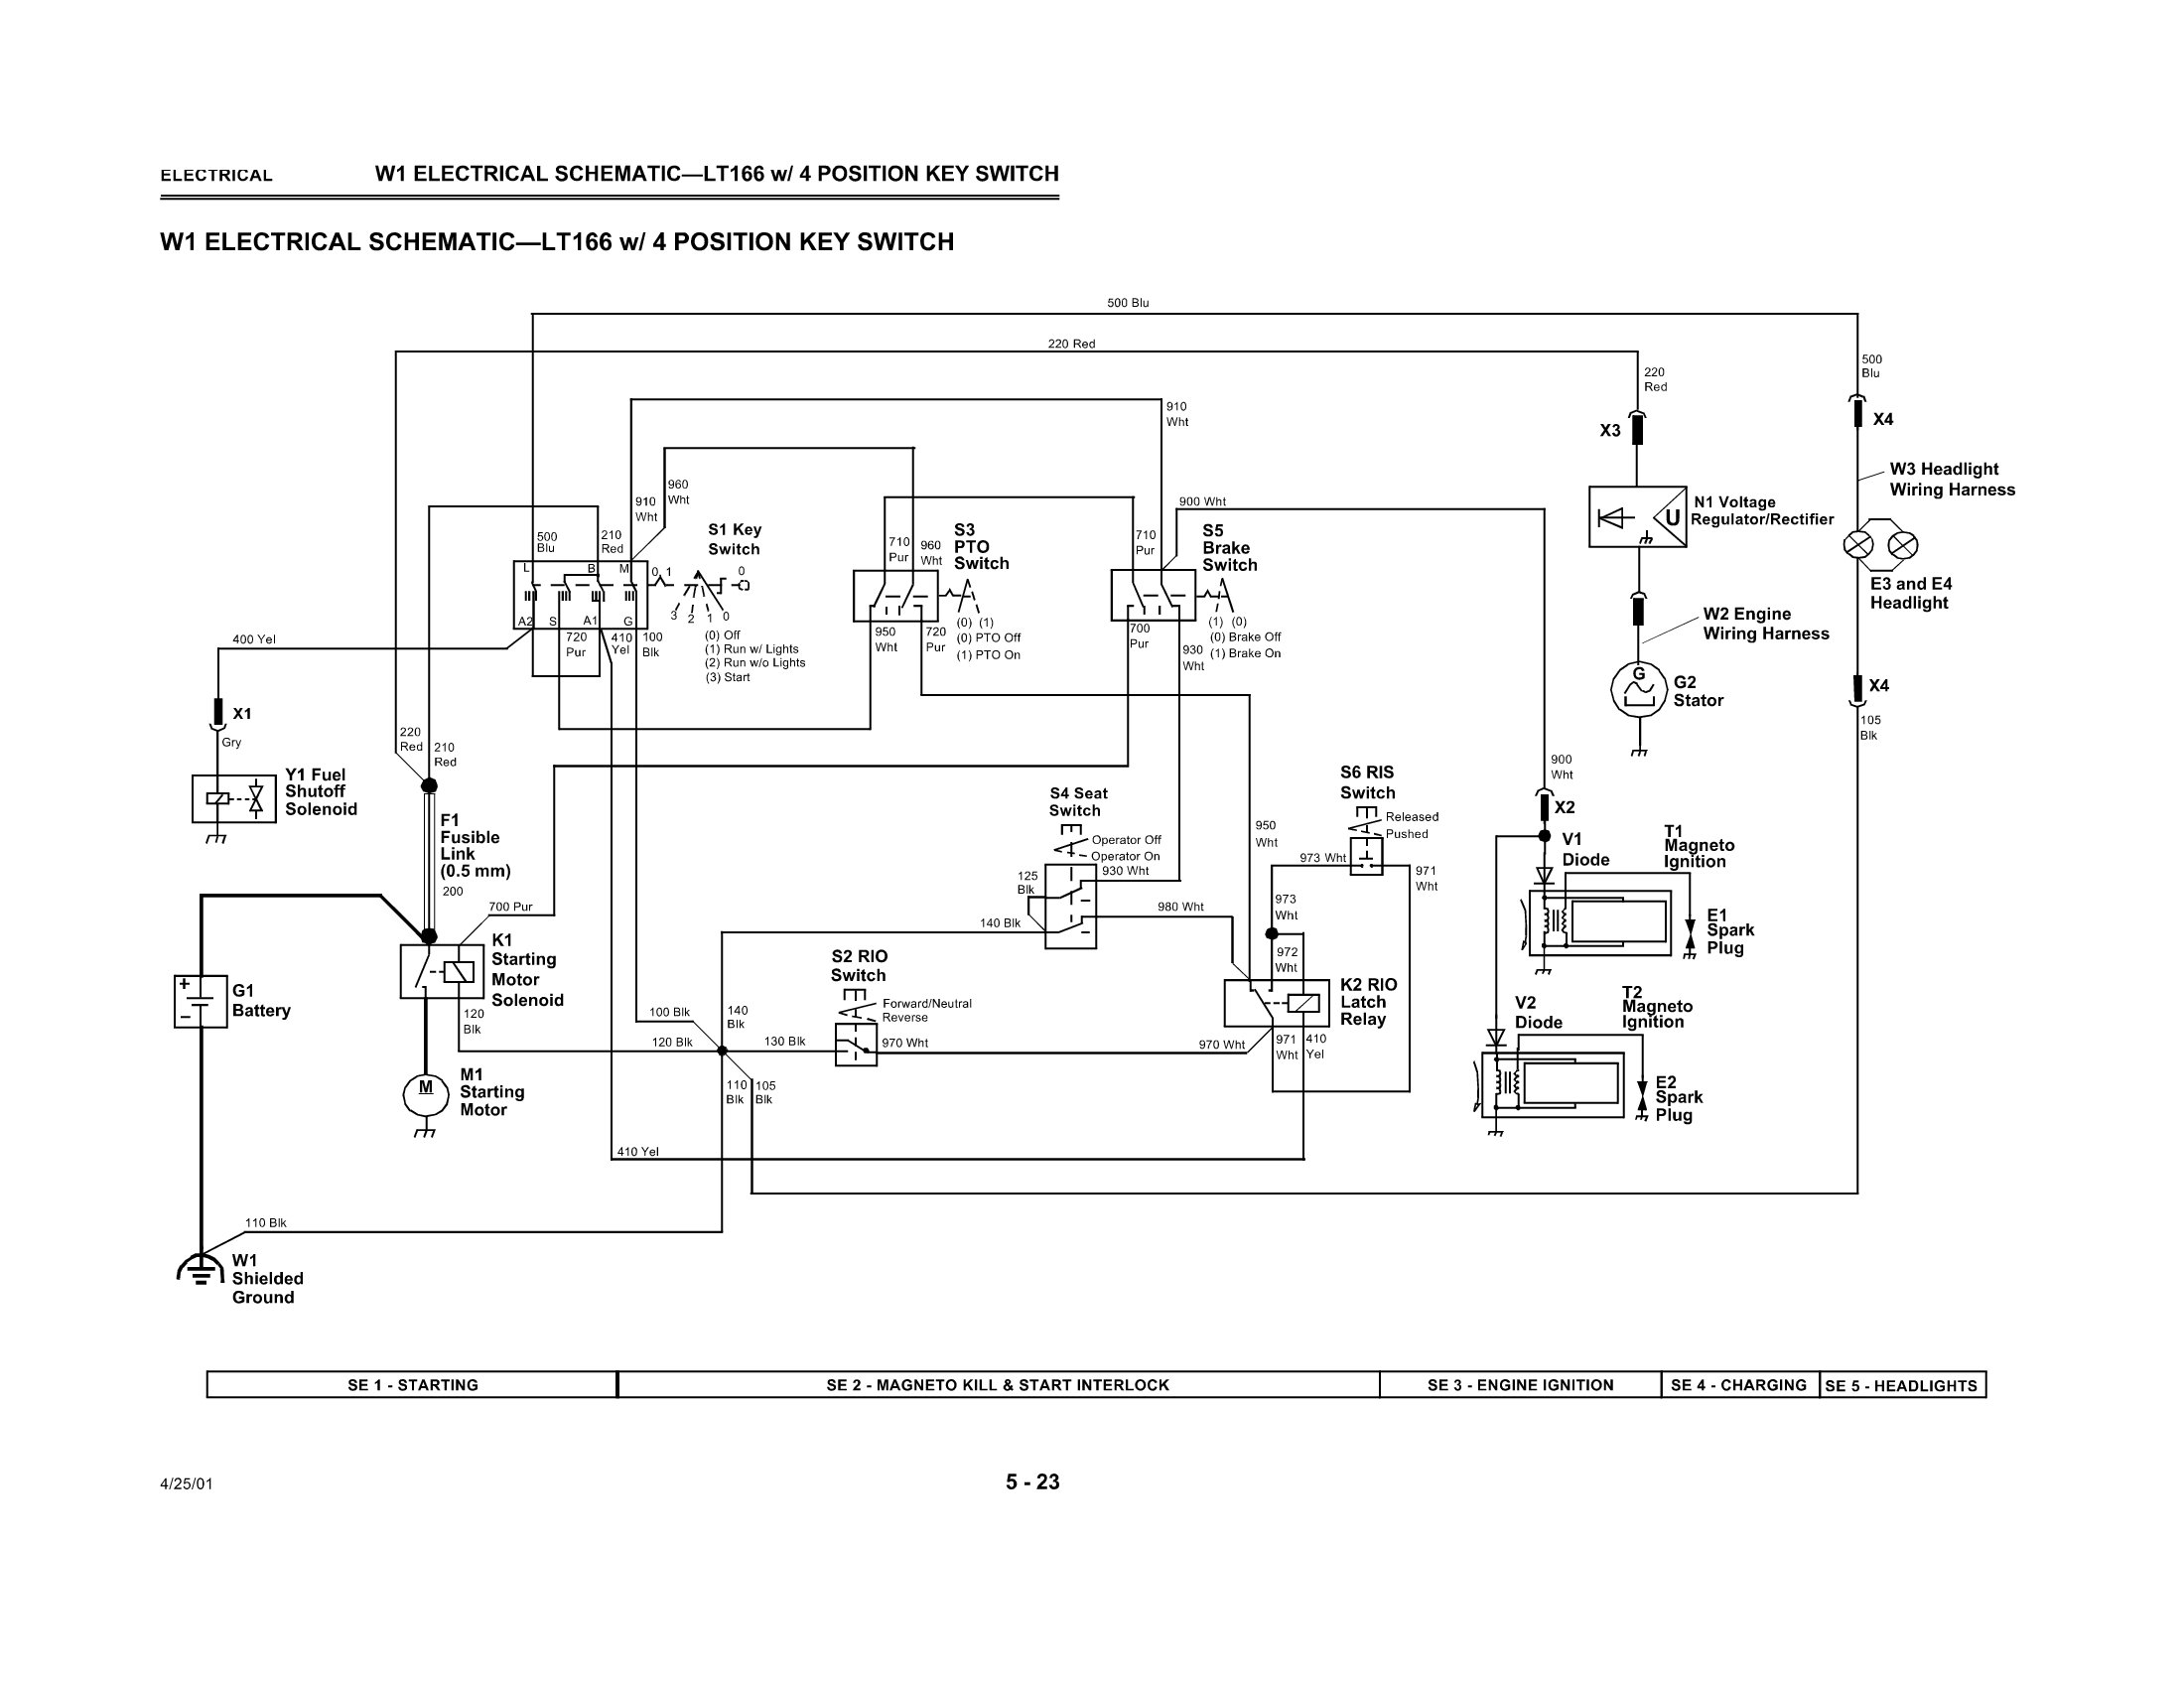 "John Deere Lt155 Engine Diagram - Wiring Diagram Var on john deere chassis, john deere fuse box diagram, john deere 212 diagram, john deere sabre mower belt diagram, john deere 42"" deck diagrams, john deere gt235 diagram, john deere fuel system diagram, john deere riding mower diagram, john deere fuel gauge wiring, john deere power beyond diagram, john deere rear end diagrams, john deere voltage regulator wiring, john deere tractor wiring, john deere 310e backhoe problems, john deere cylinder head, john deere repair diagrams, john deere starters diagrams, john deere 345 diagram, john deere electrical diagrams, john deere 3020 diagram,"